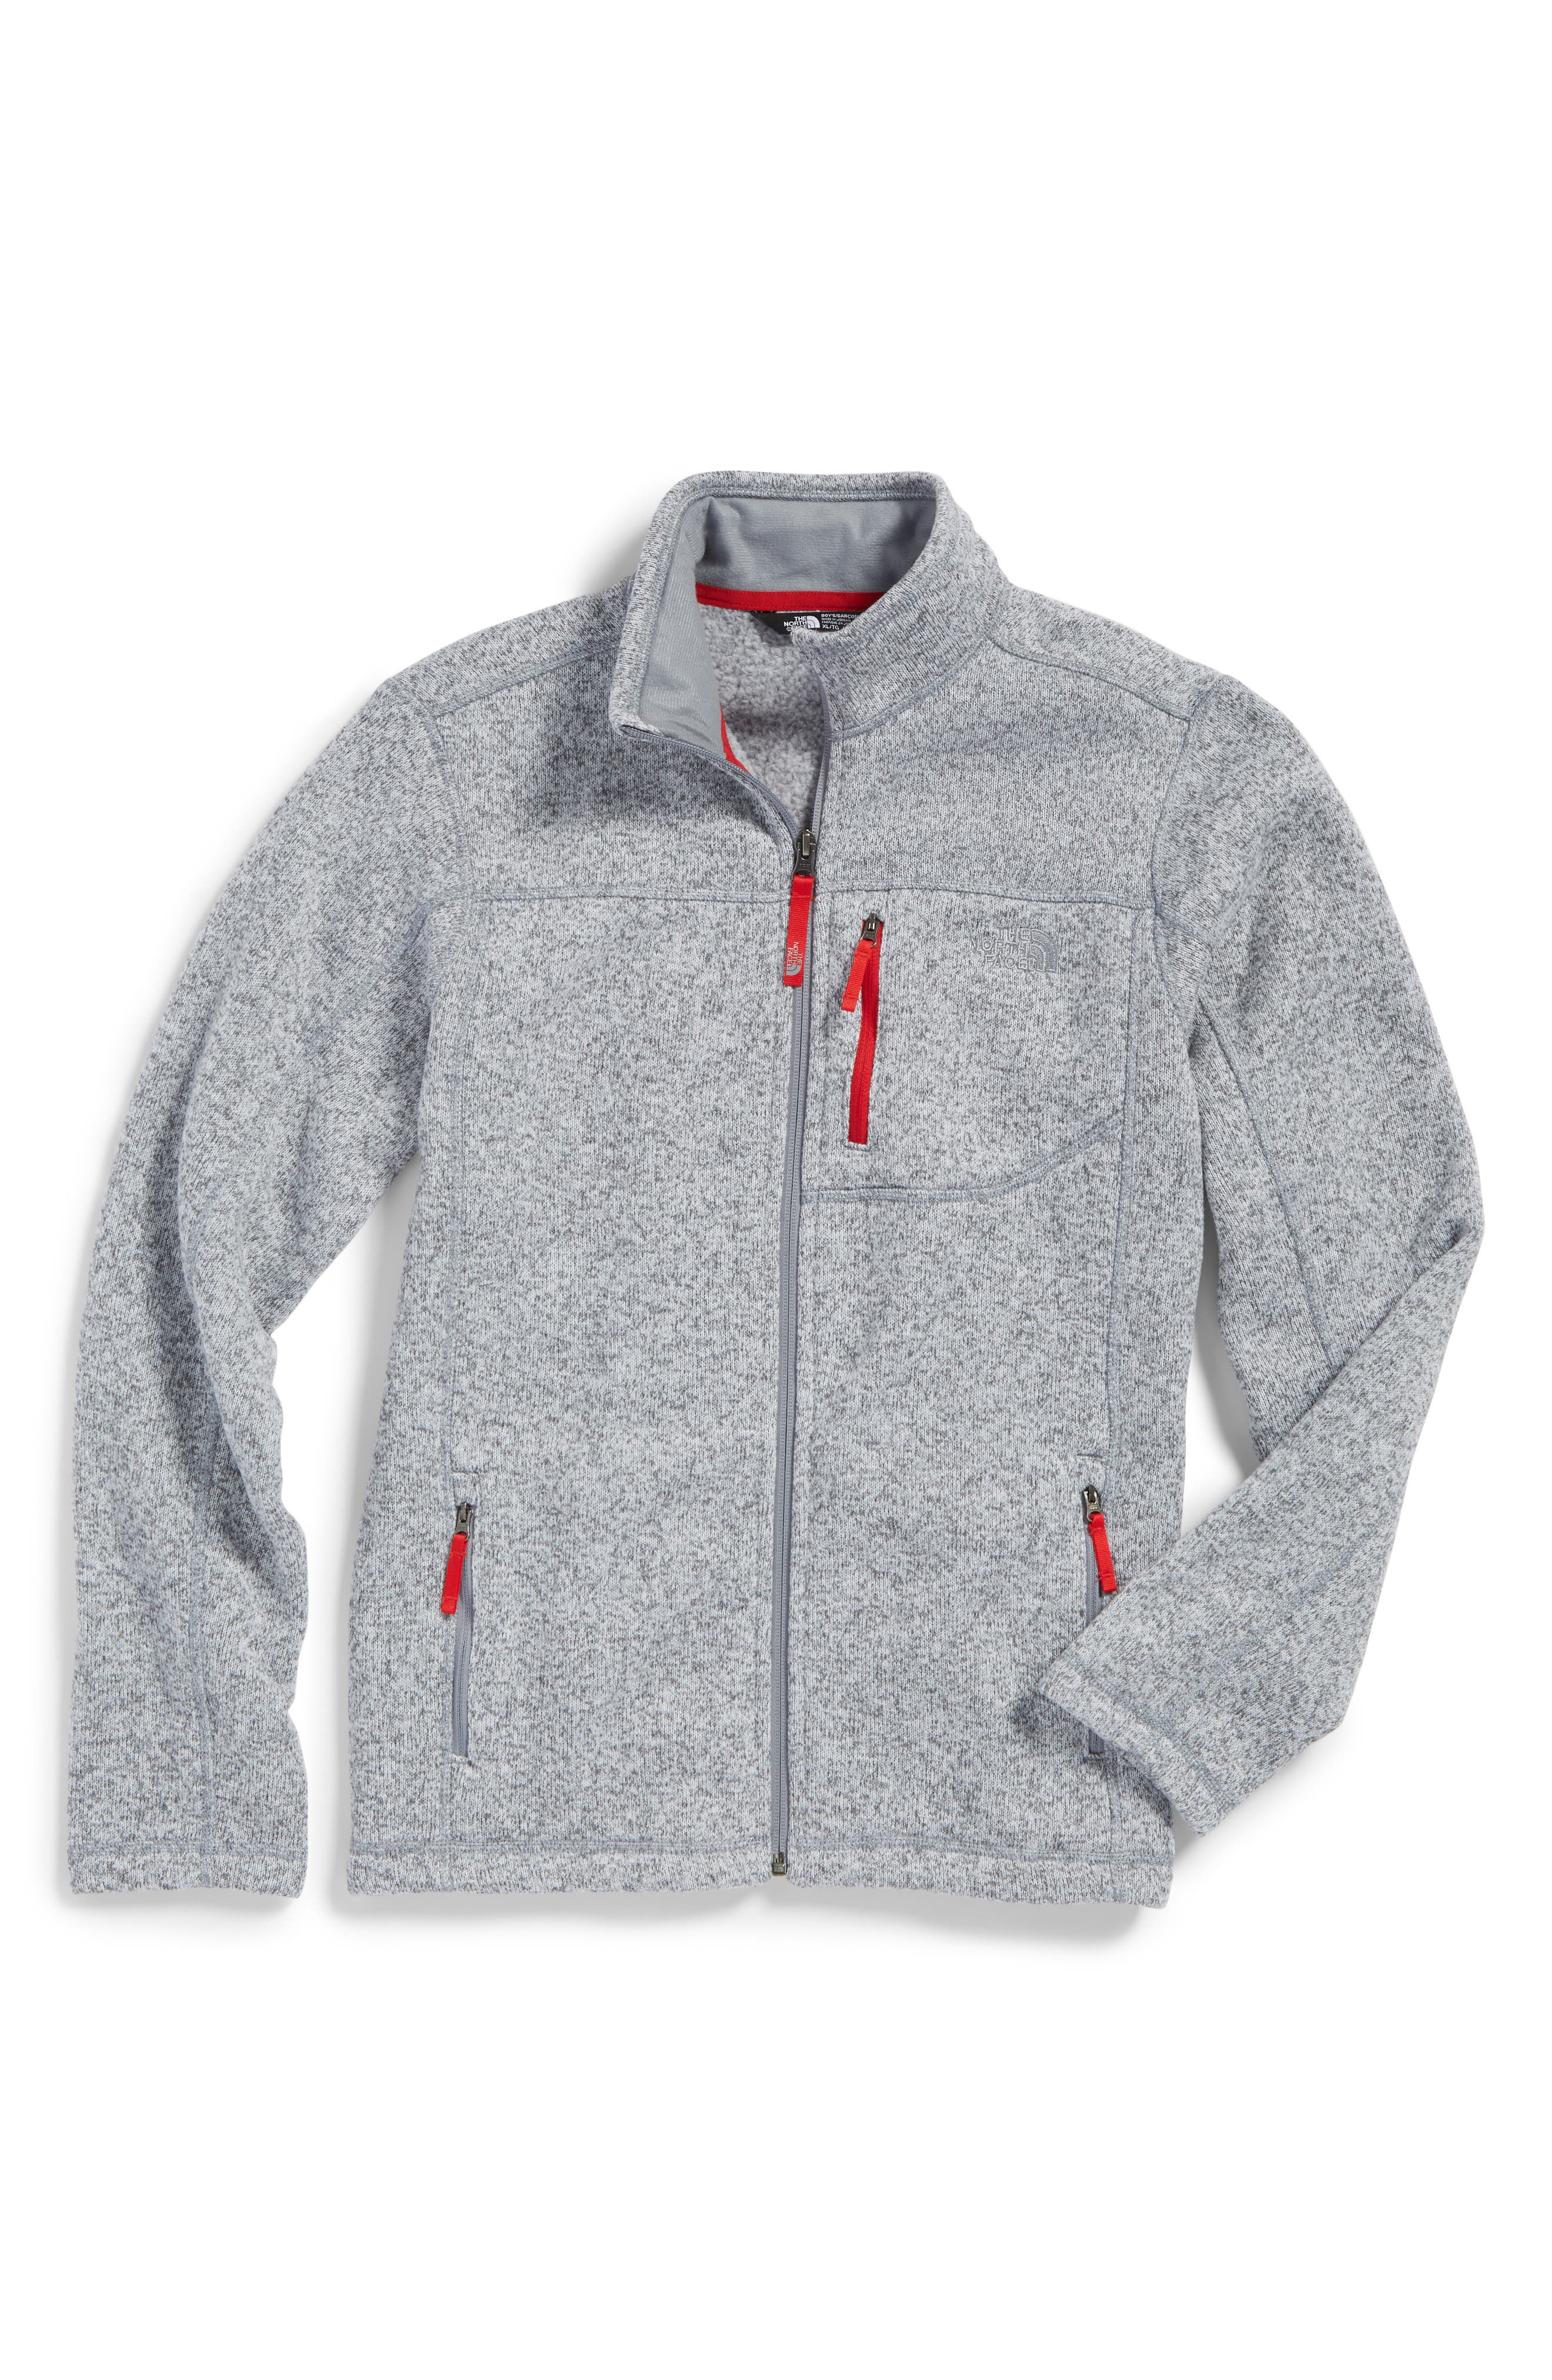 Main Image - The North Face Gordon Lyons Sweater Fleece Zip Jacket (Big Boys)